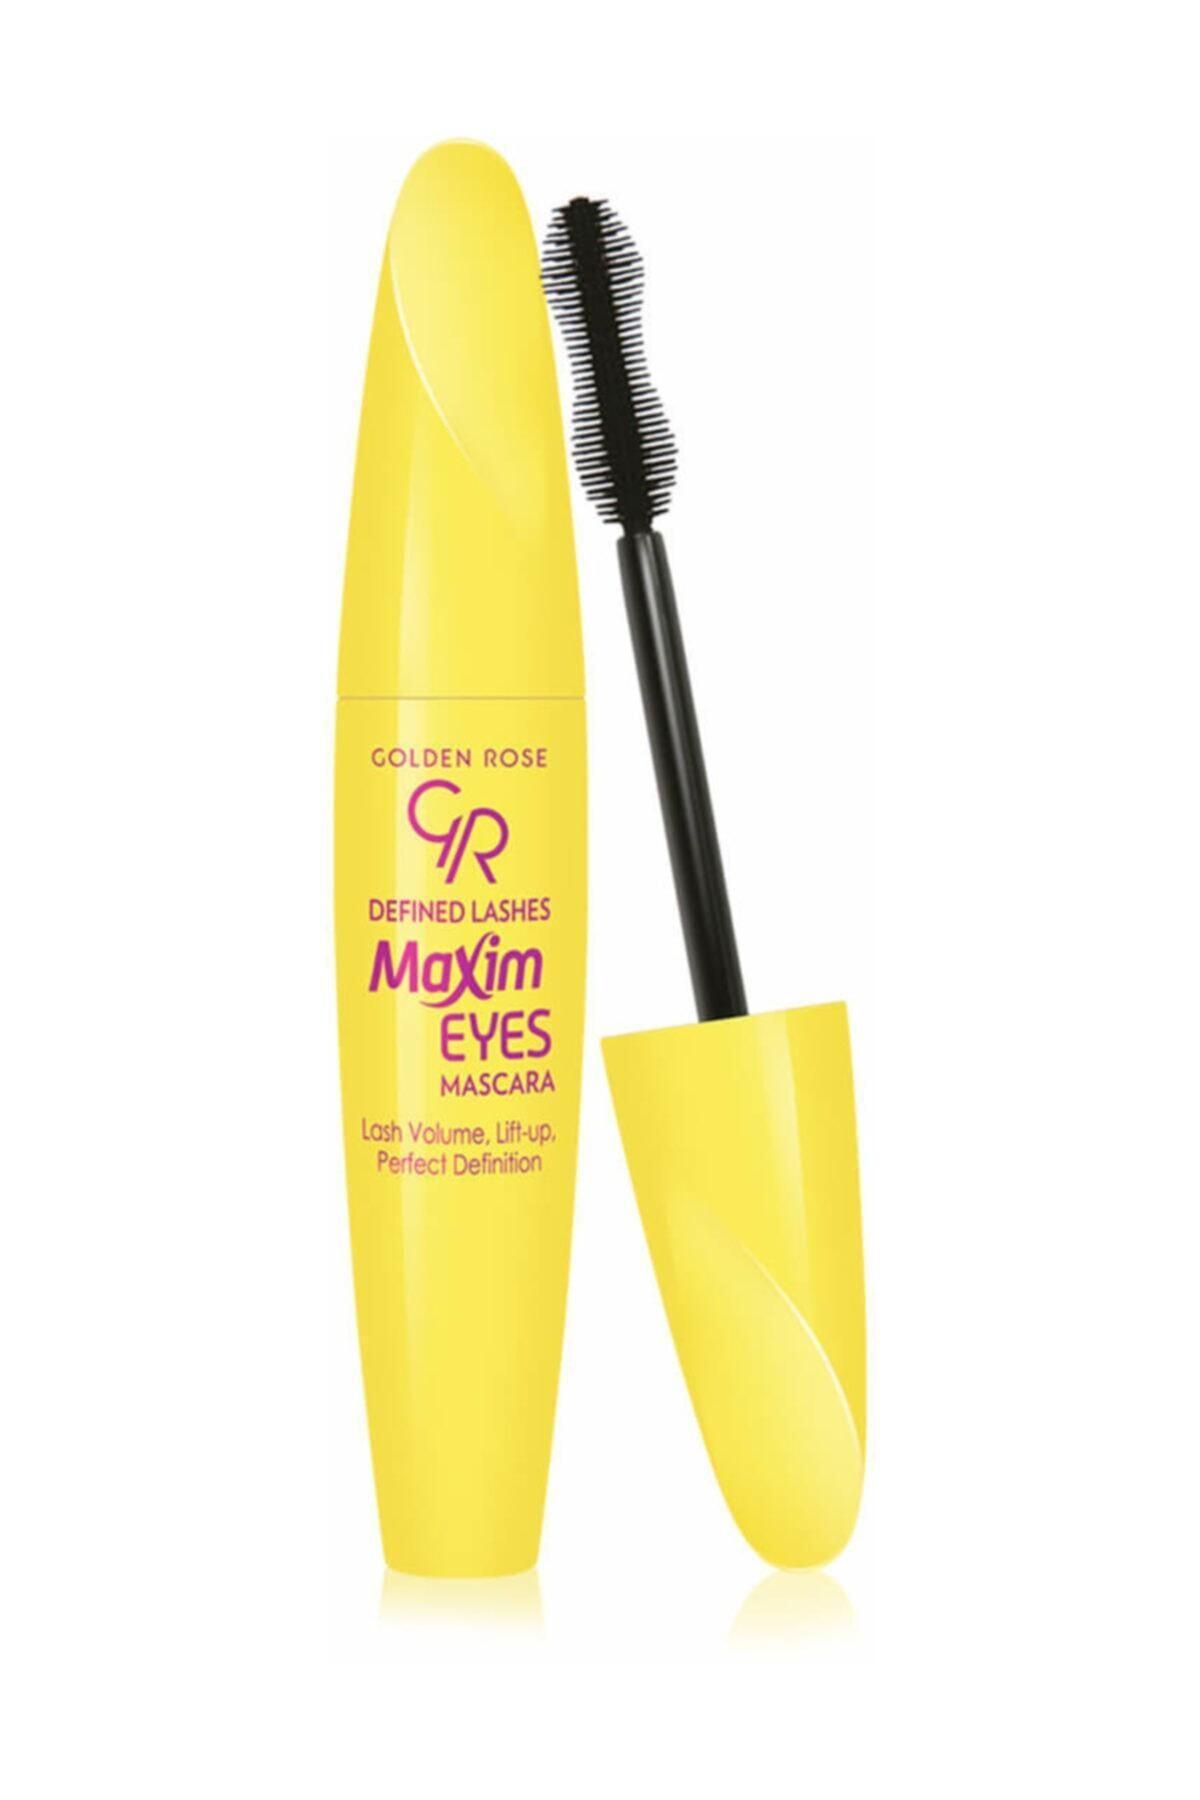 Golden Rose Siyah Maskara - Defined Lashes Maxim Eyes Mascara 8691190068653 1